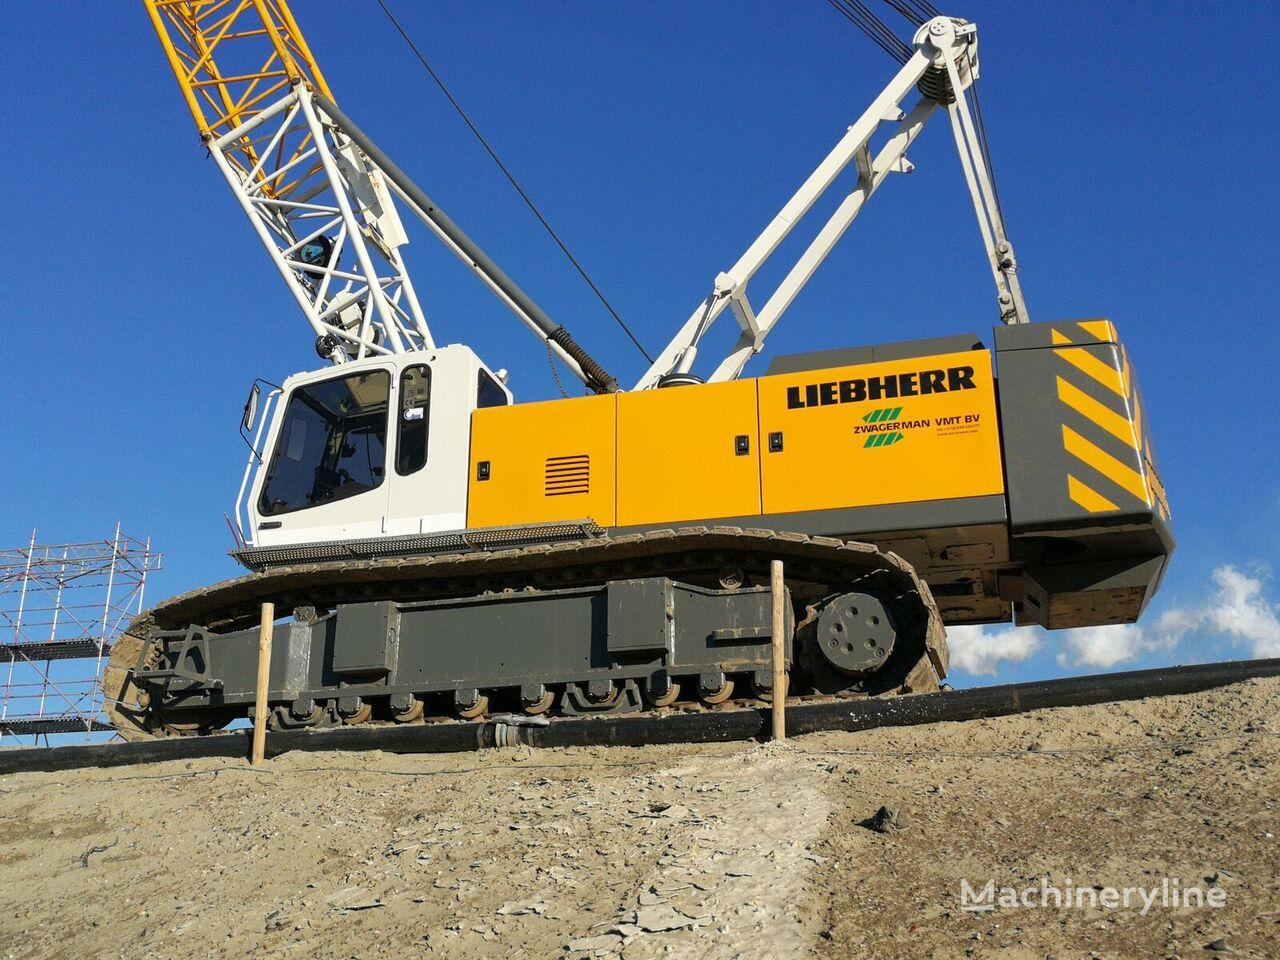 LIEBHERR HS 853 HD crawler crane